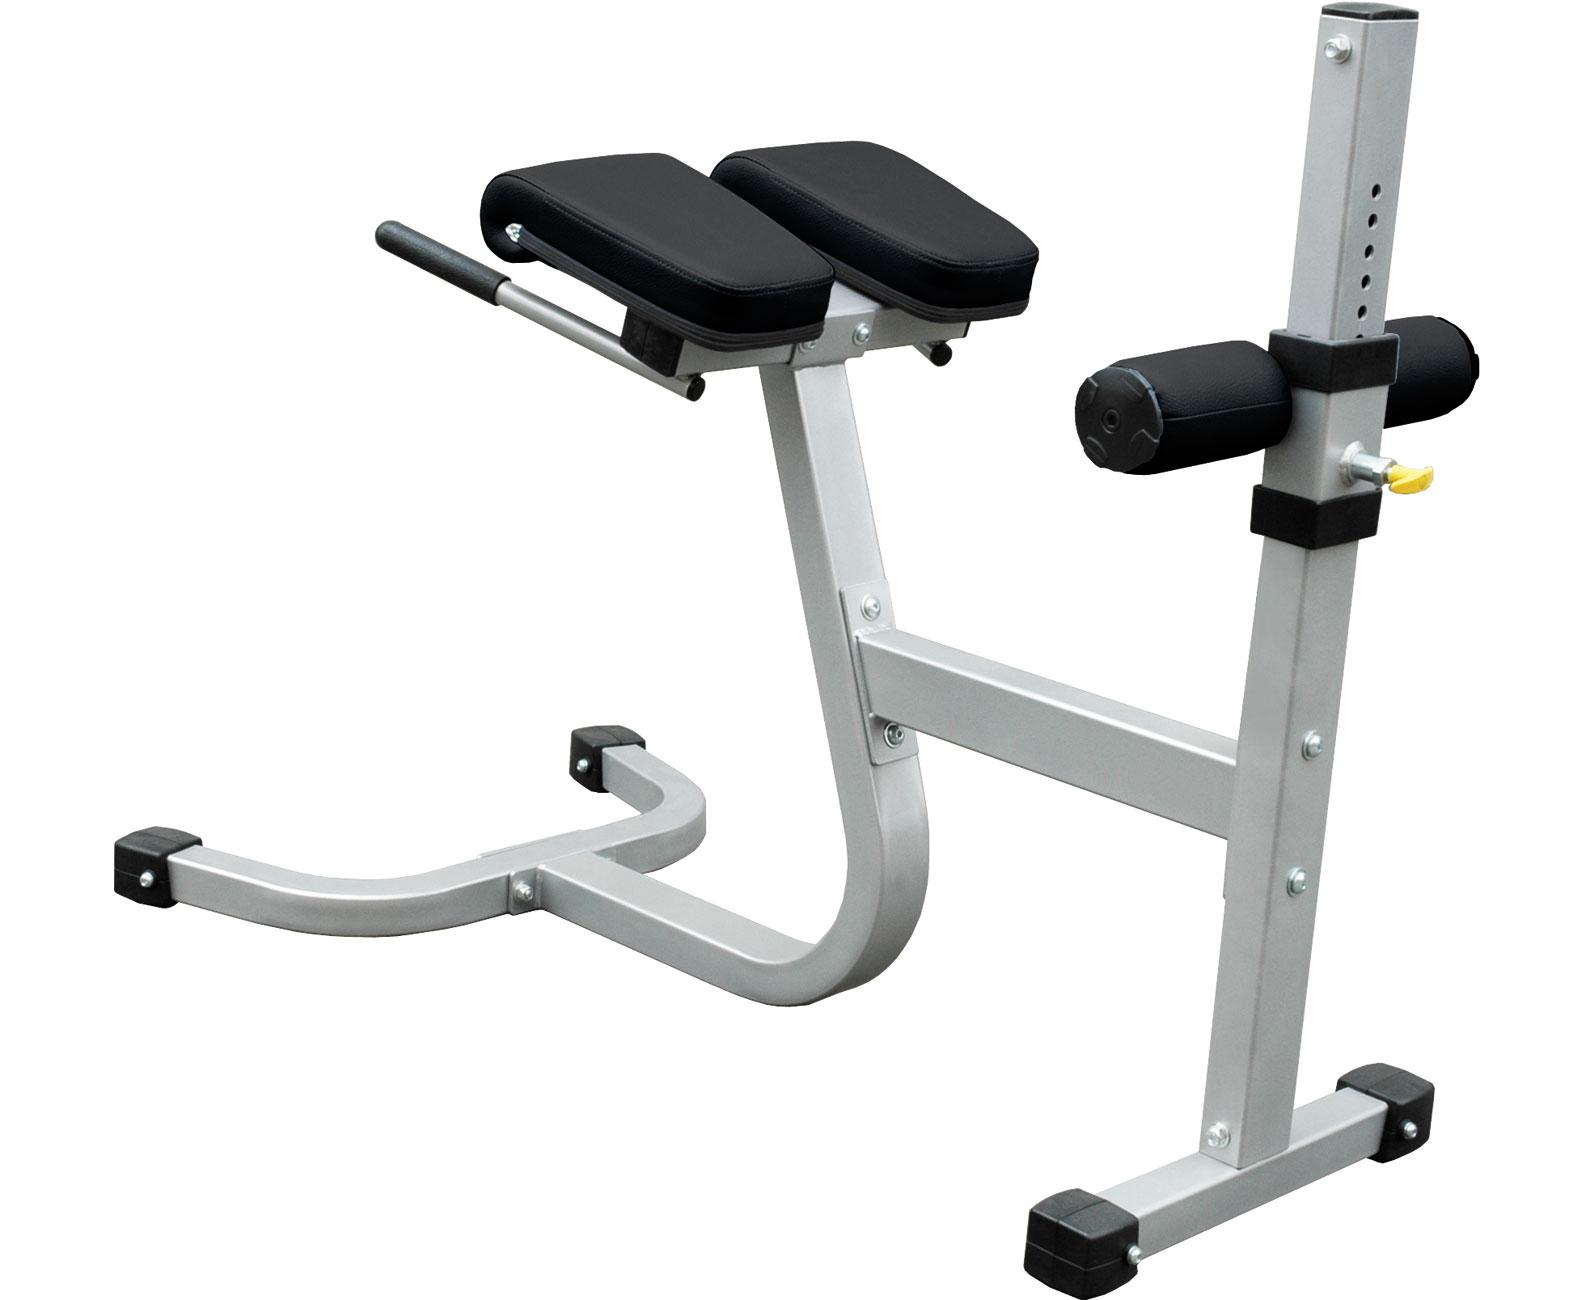 Aparat hiperextensii tip scaun roman IFRC, Impulse Fitness